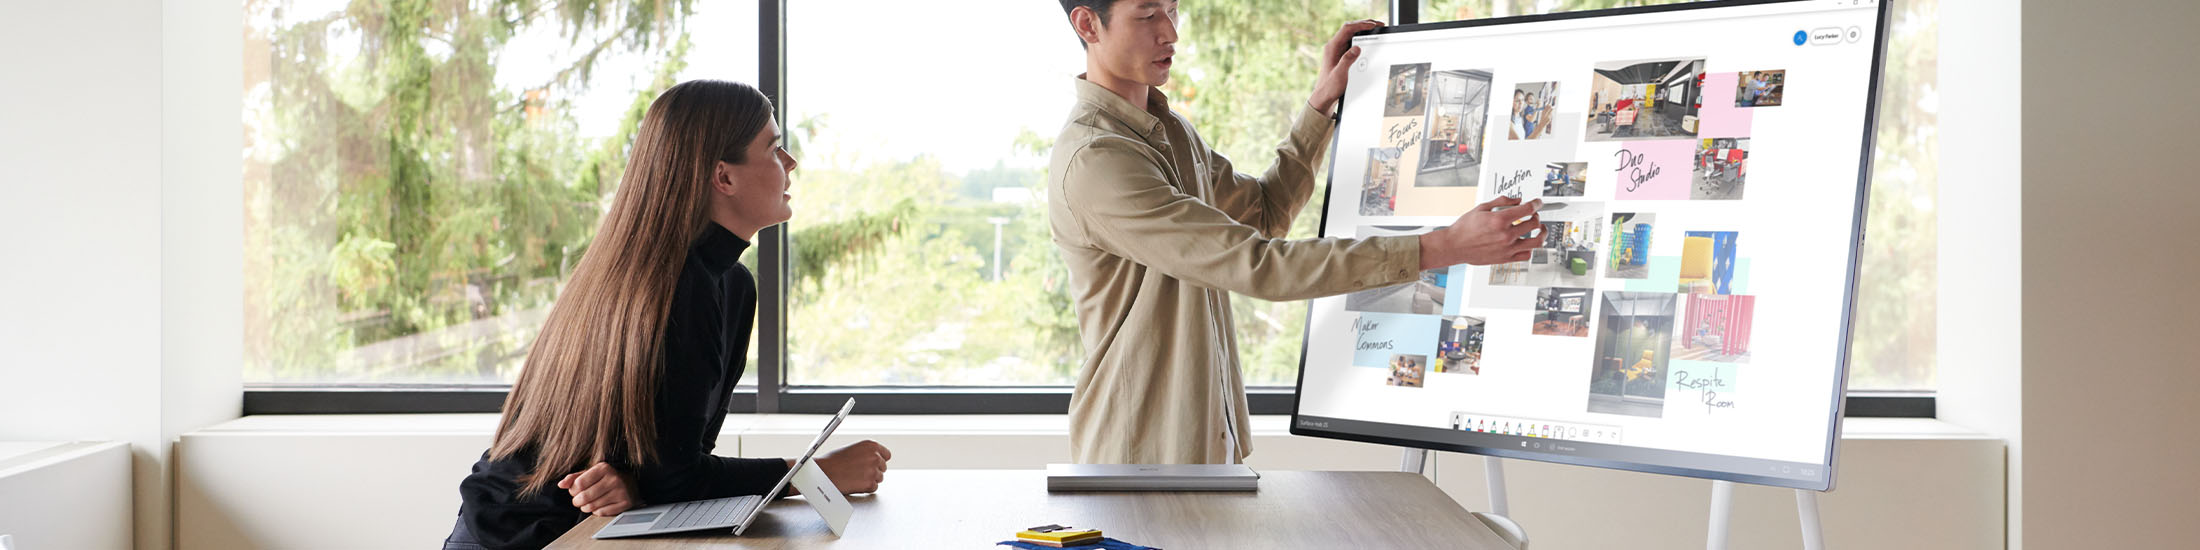 Modern Office | Smart Collaboration